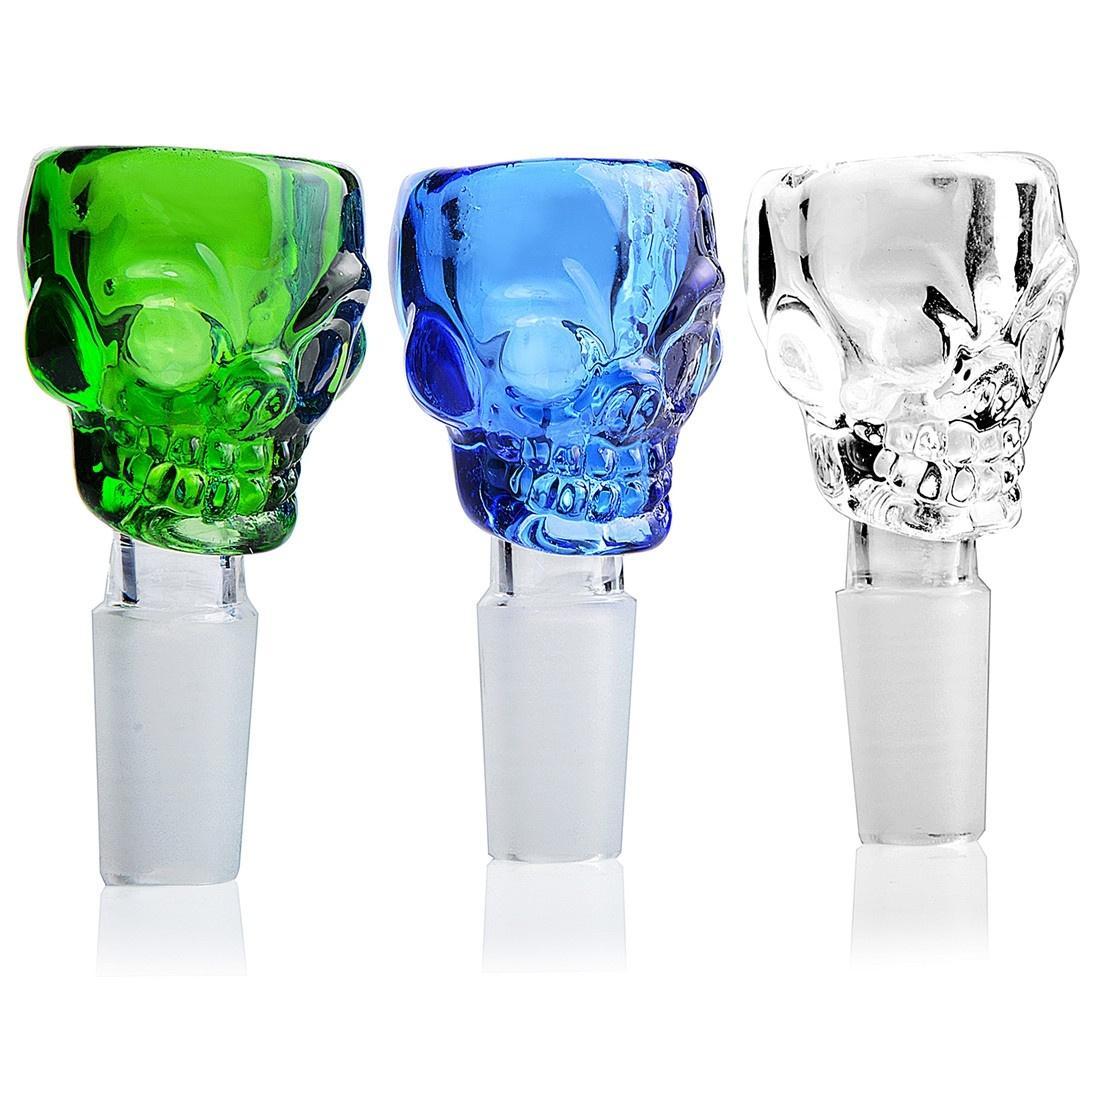 Verre Bols Super Size Skull verre Bong Bowl pour bongs fumeurs en verre très lourd Fabricant mâle bol 14mm